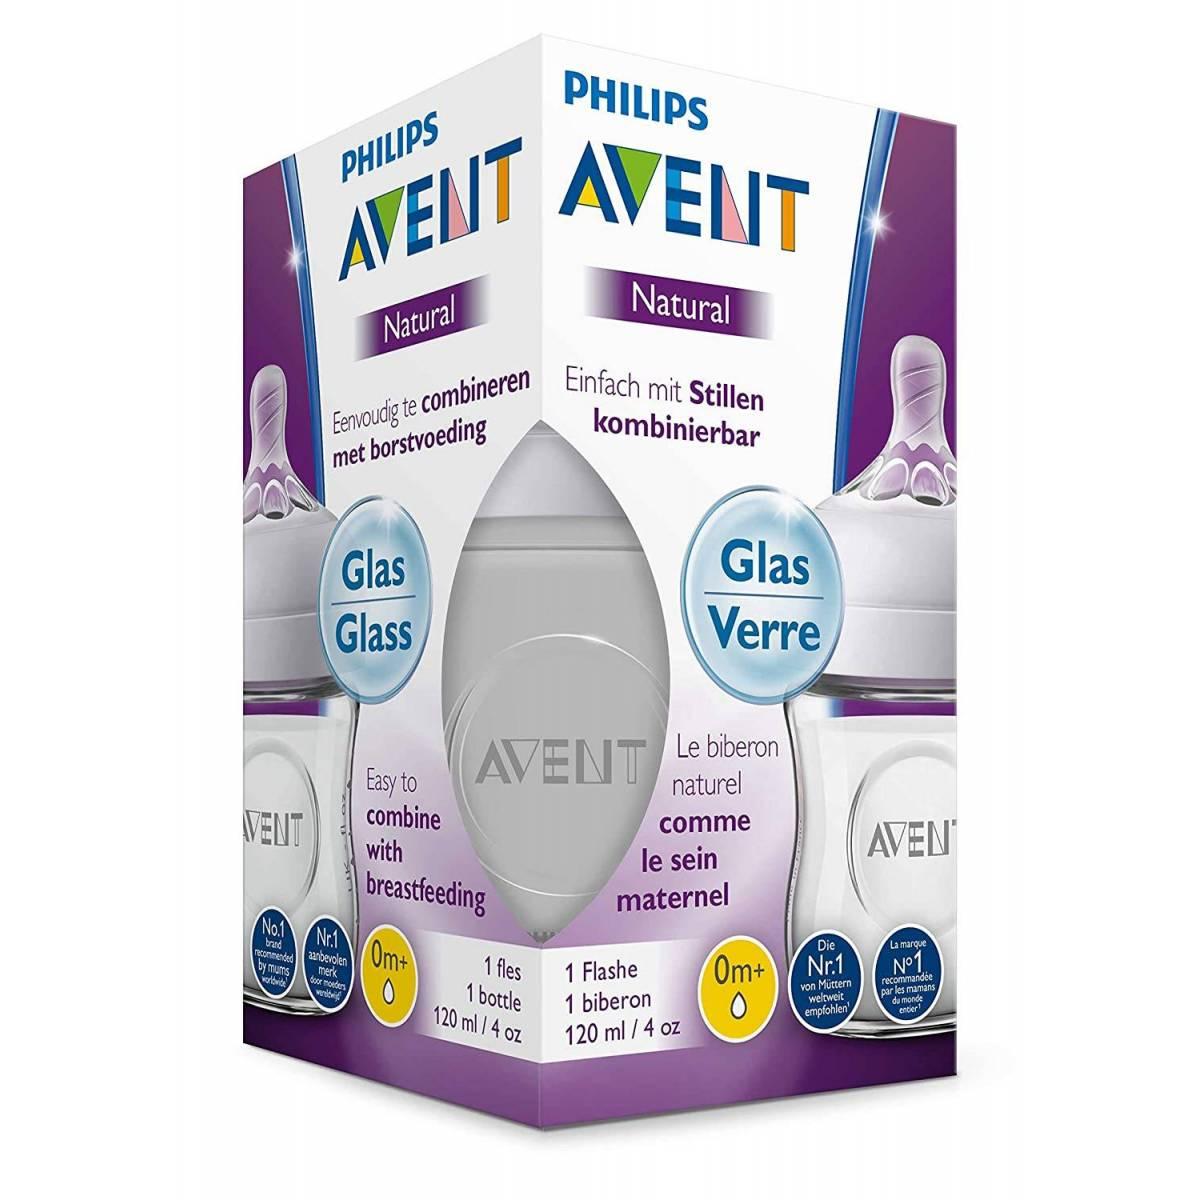 Philips AVENT Biberon Natural verre 120ml